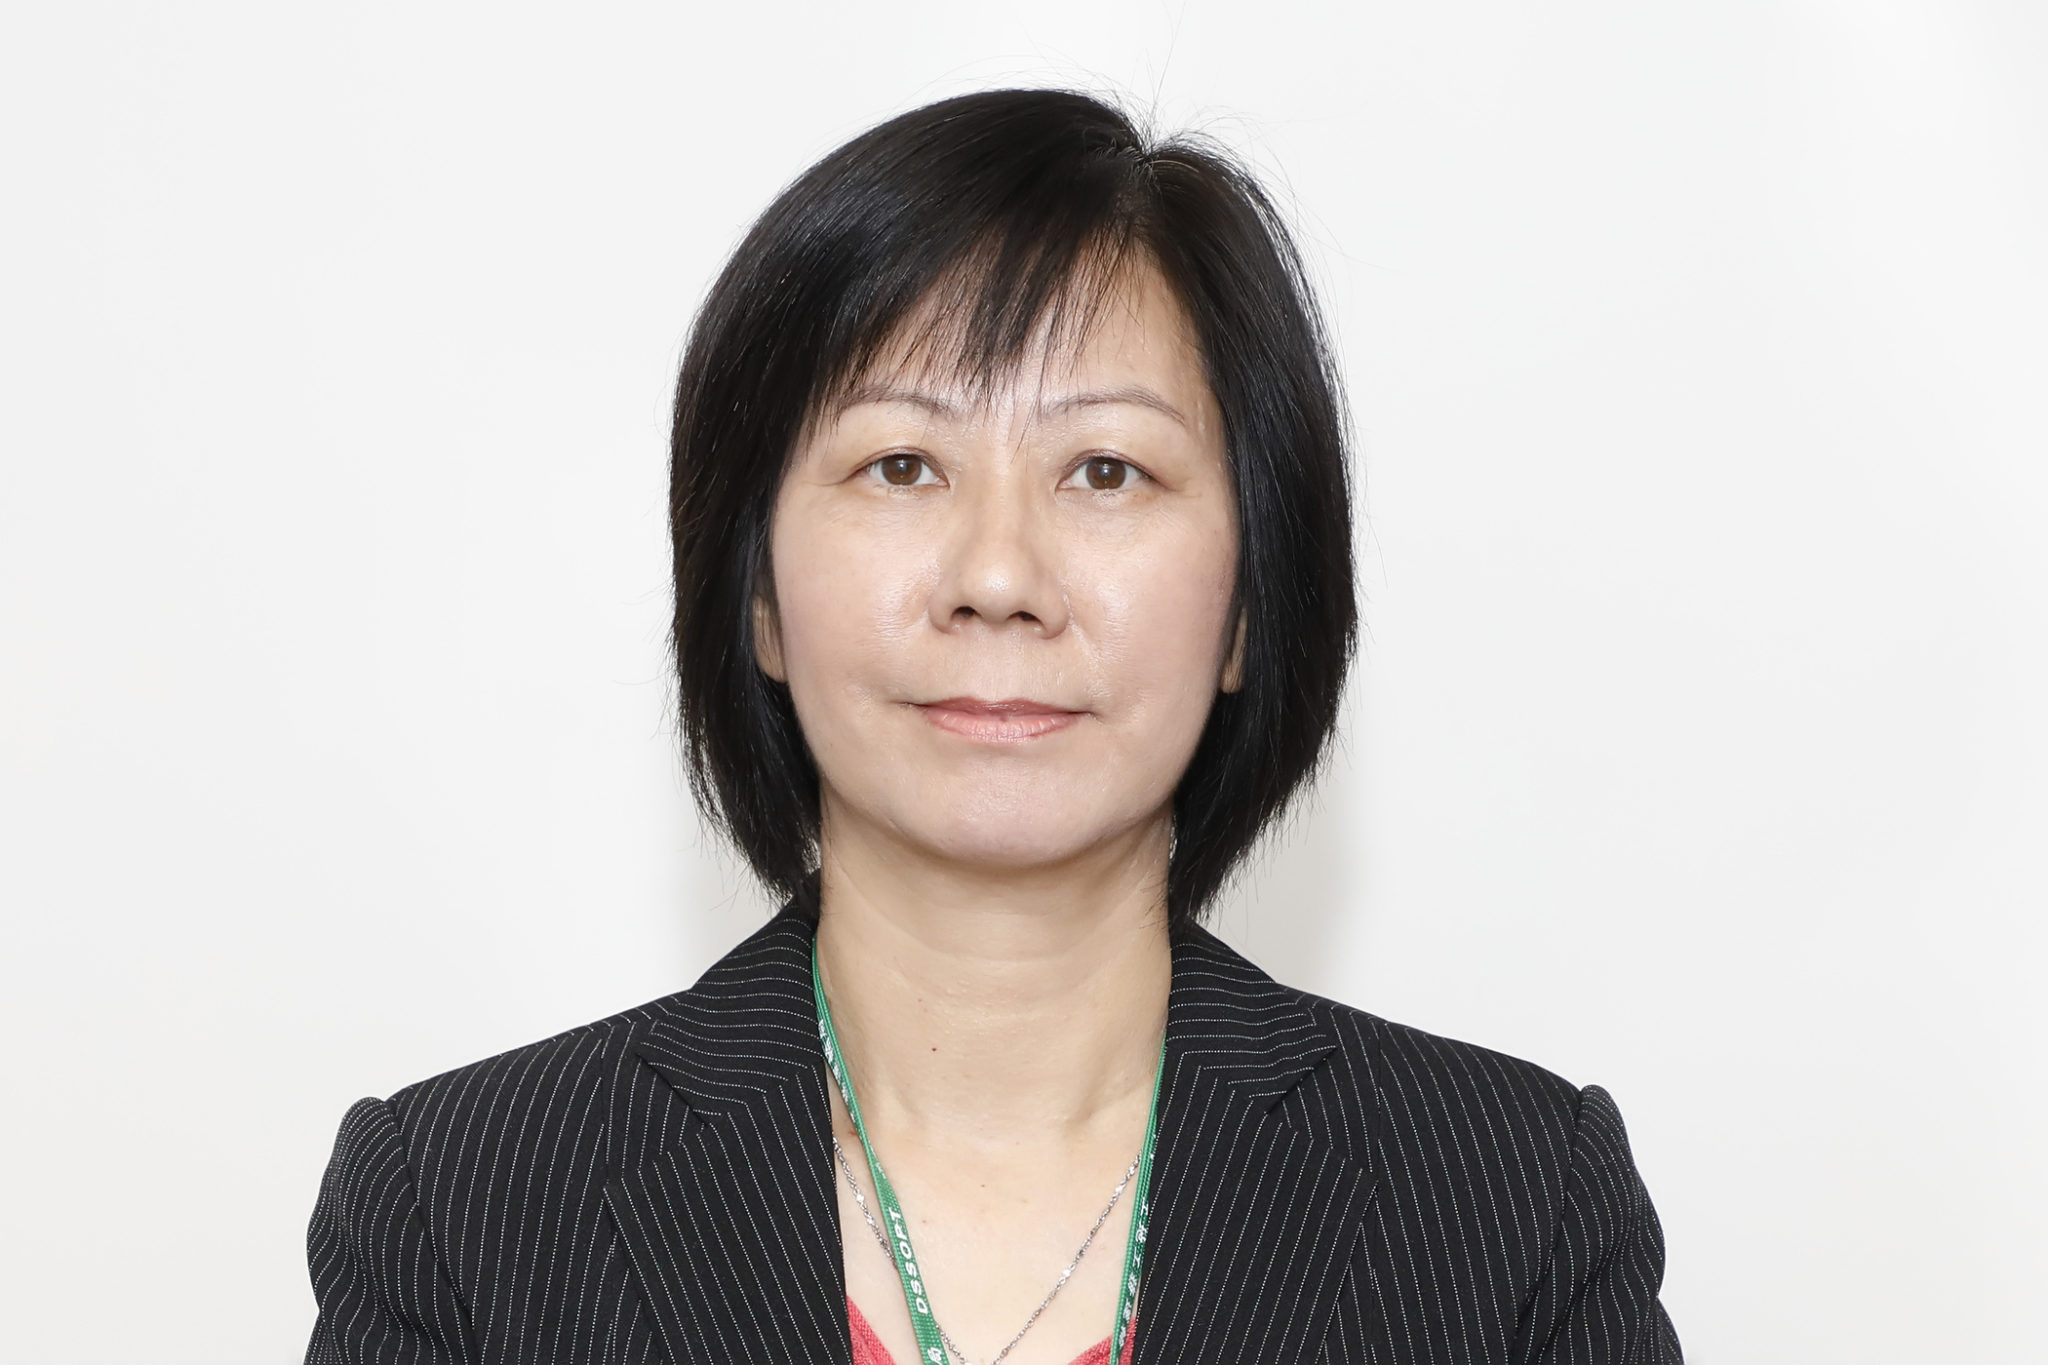 DSSOPT | Chan Pou Ha garante segurança no prédio Mei Lok Garden